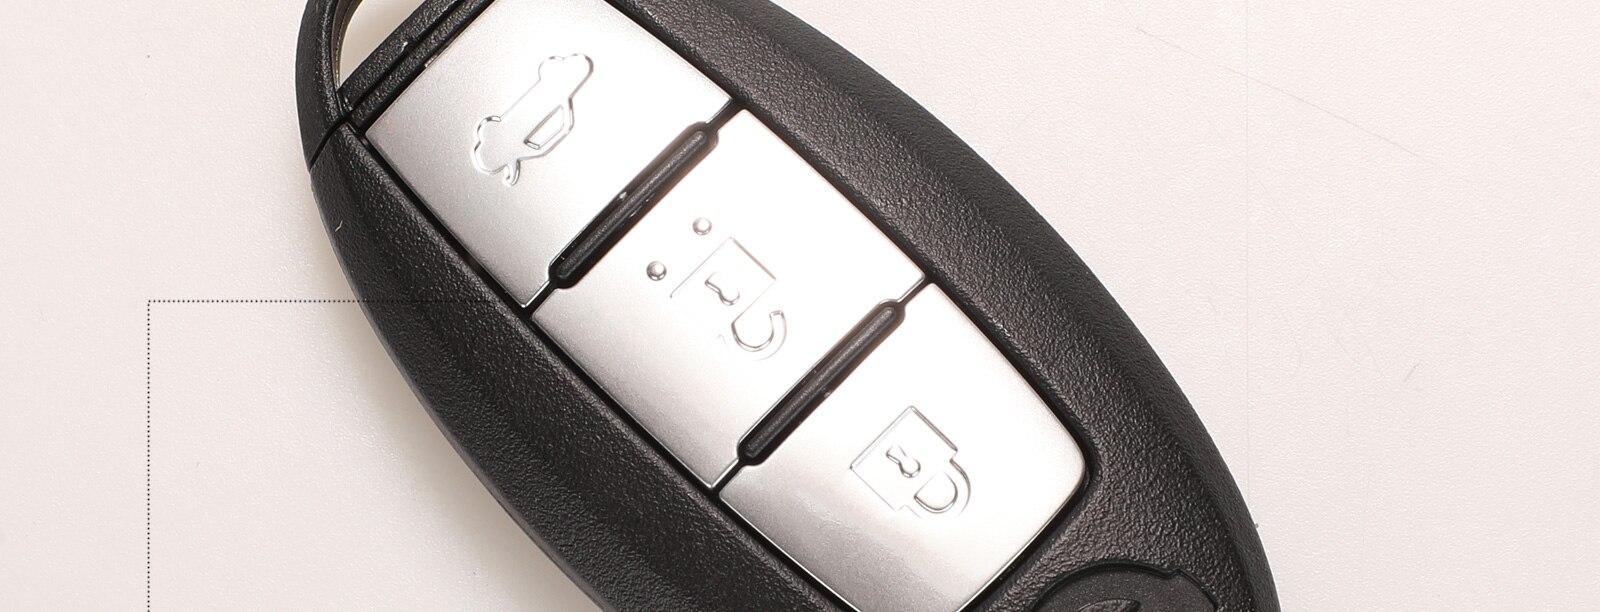 Kutery inteligente remoto chave 3 botões para